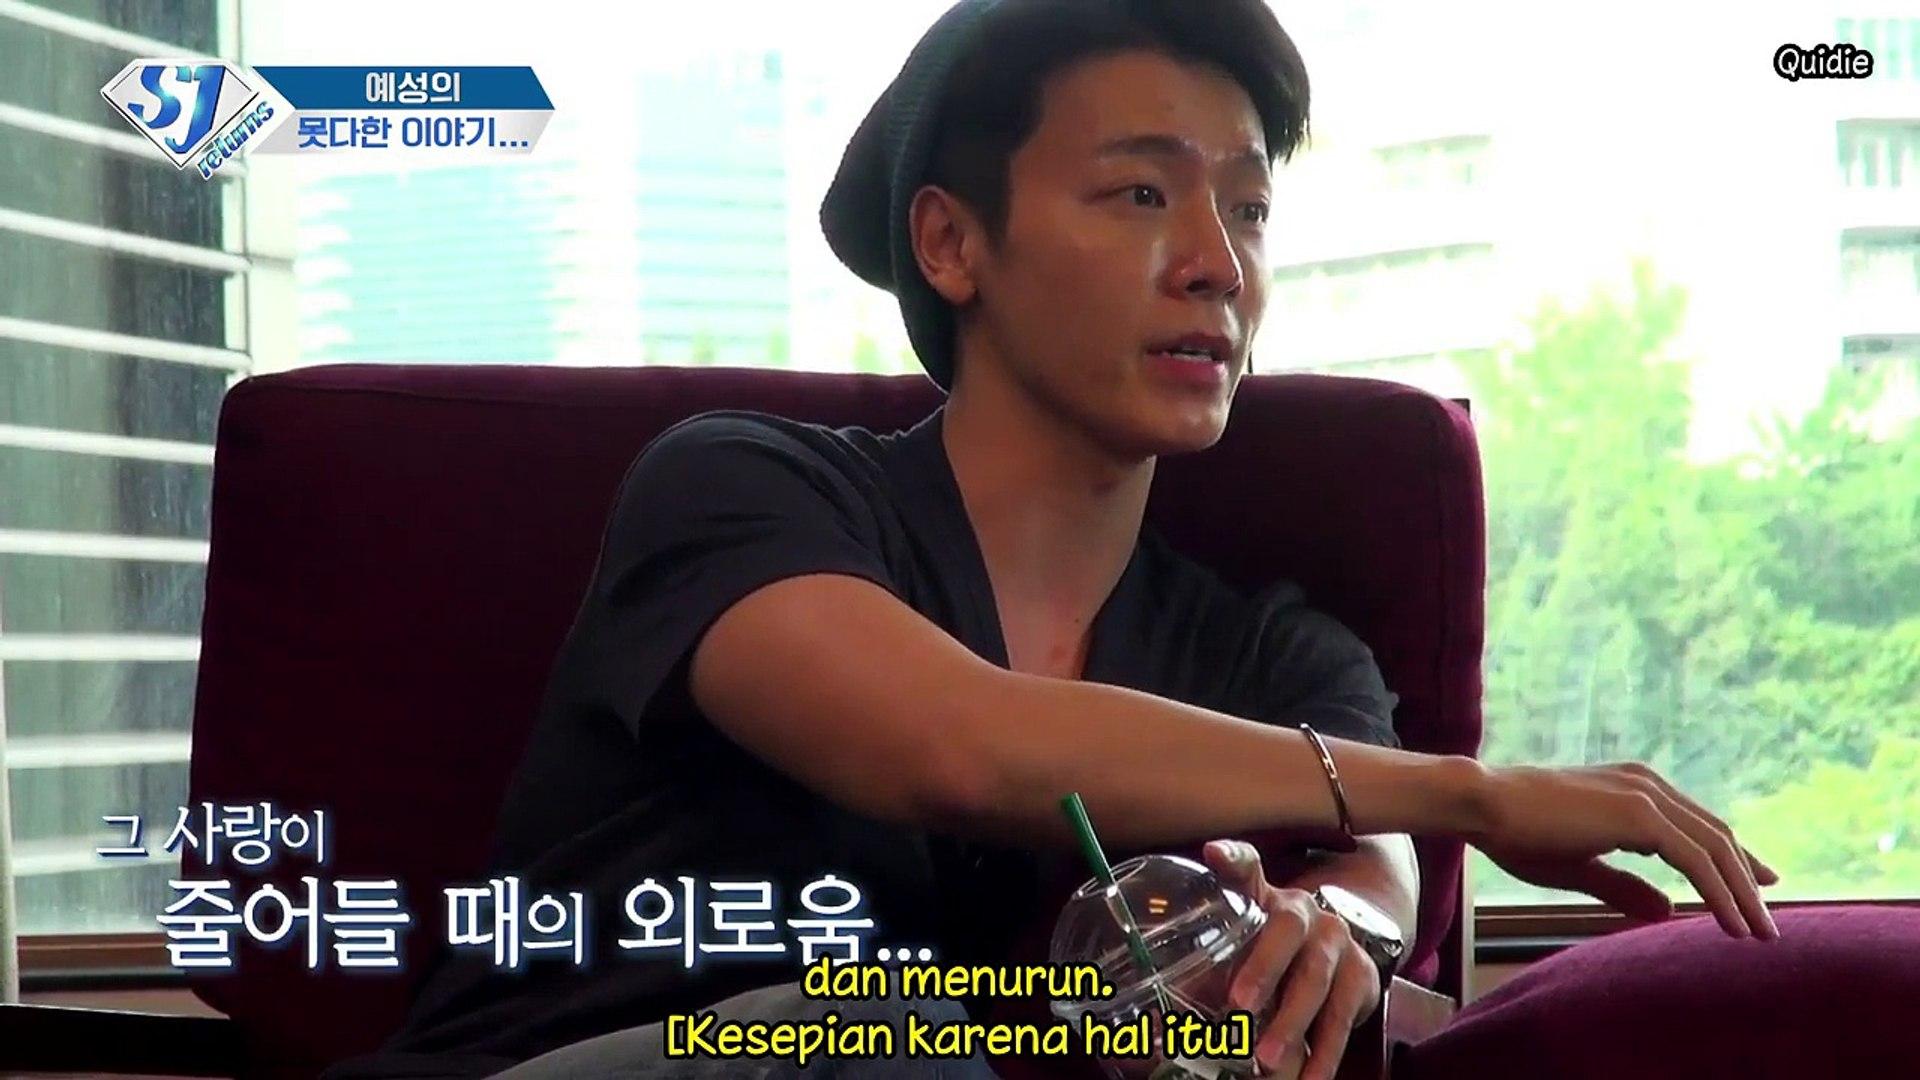 [INDO SUB] SJ Returns EP 10